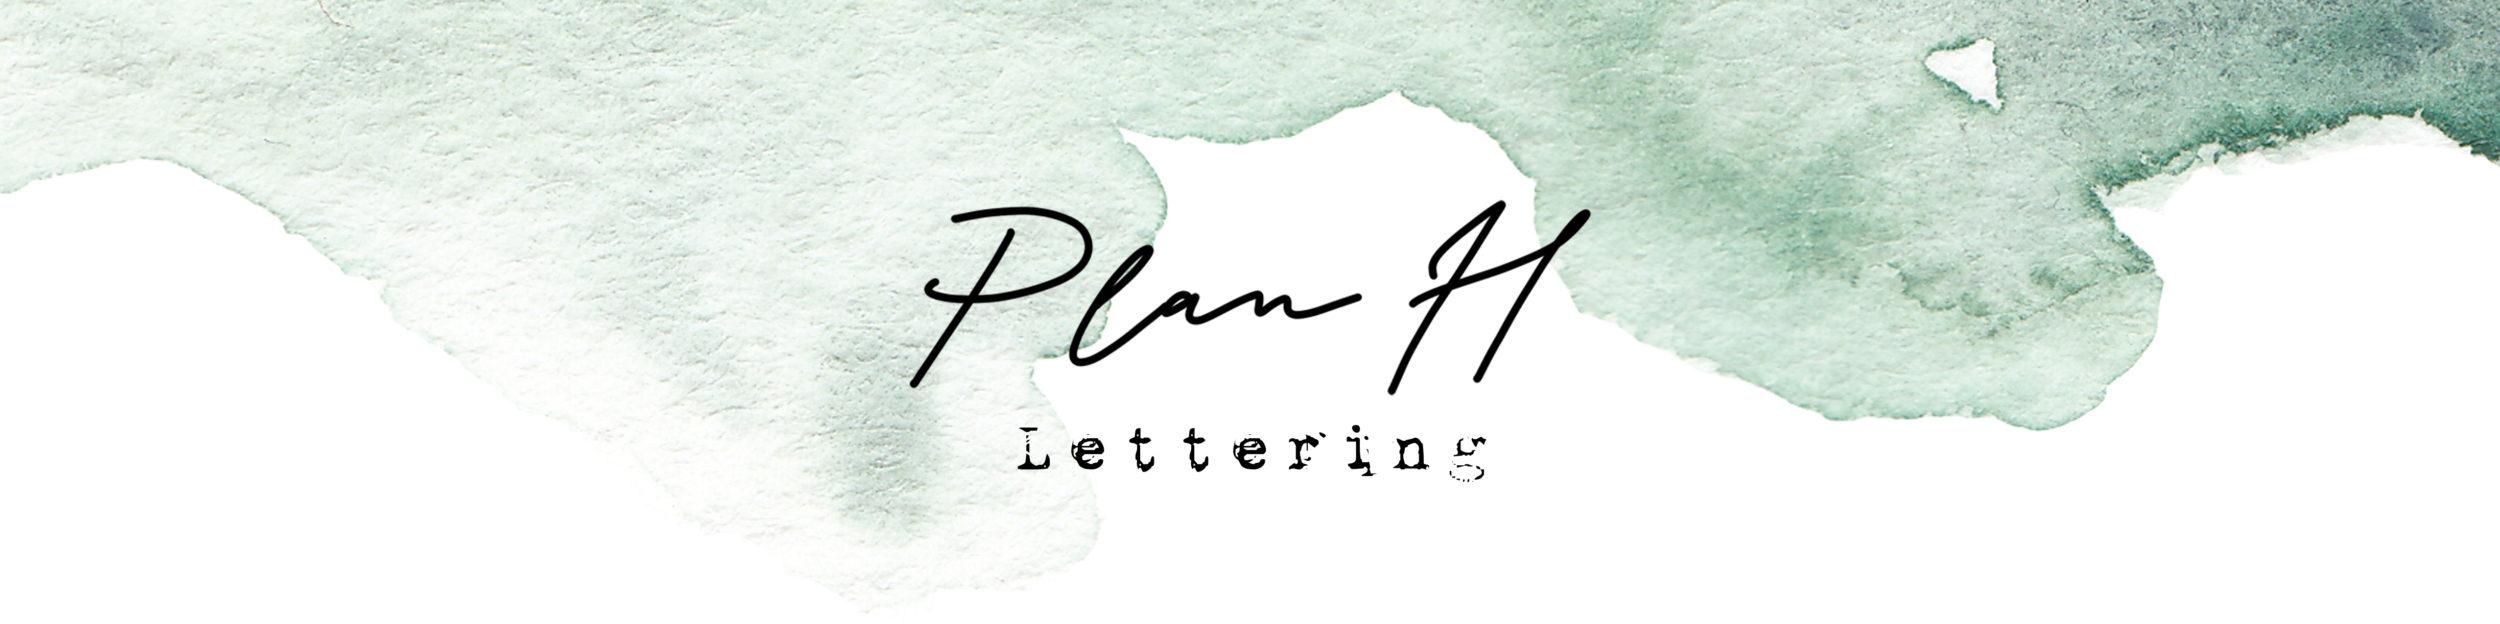 Plan H – Lettering